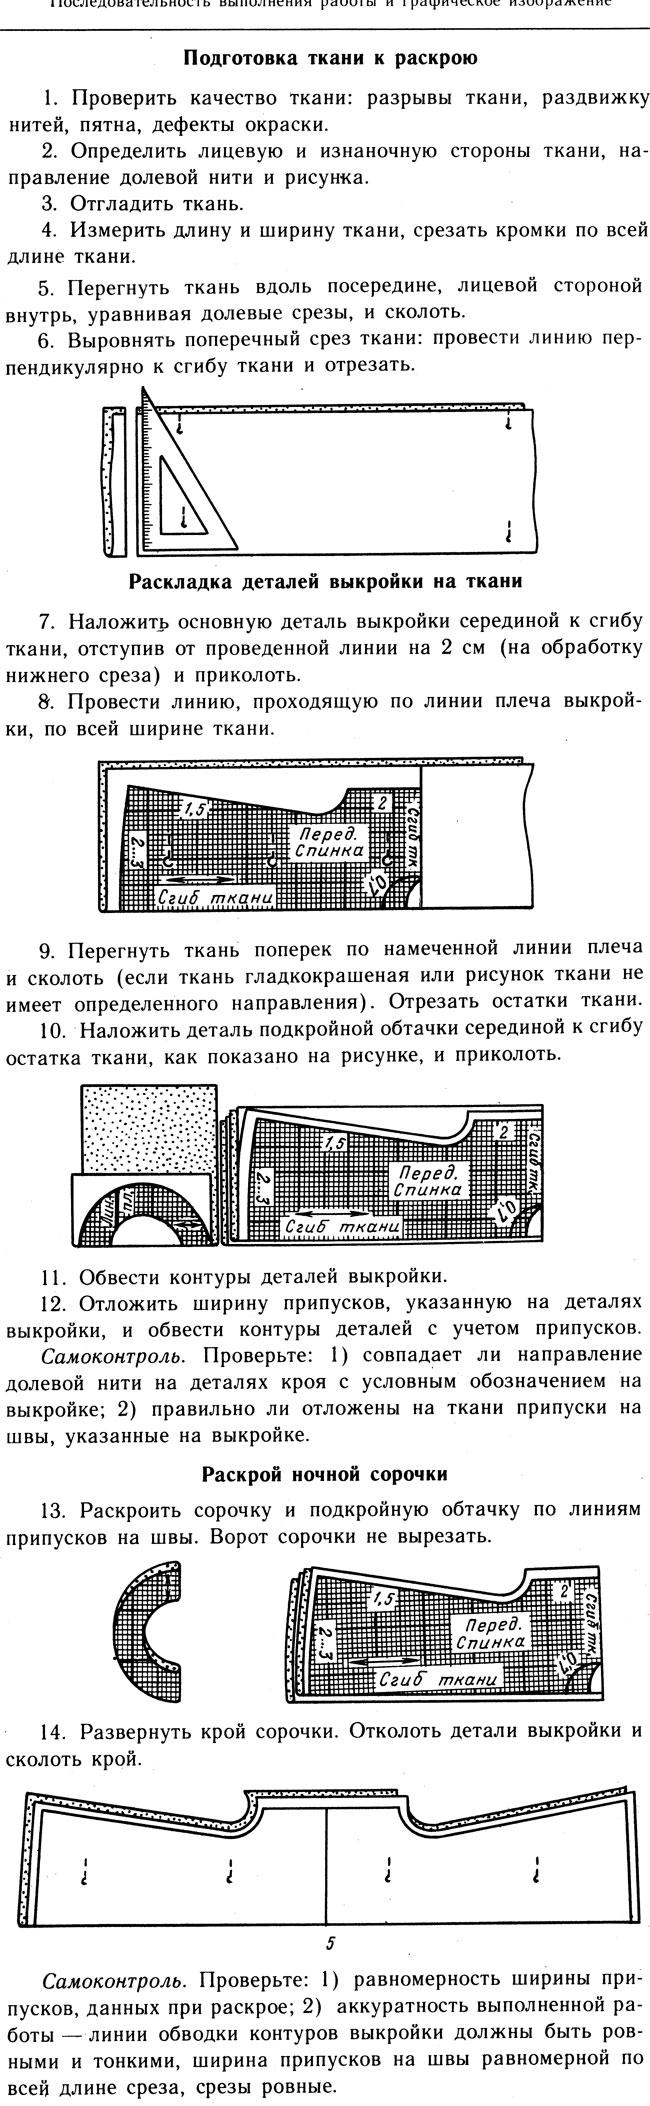 http://pedagogic.ru/books/item/f00/s00/z0000048/pic/000099.jpg